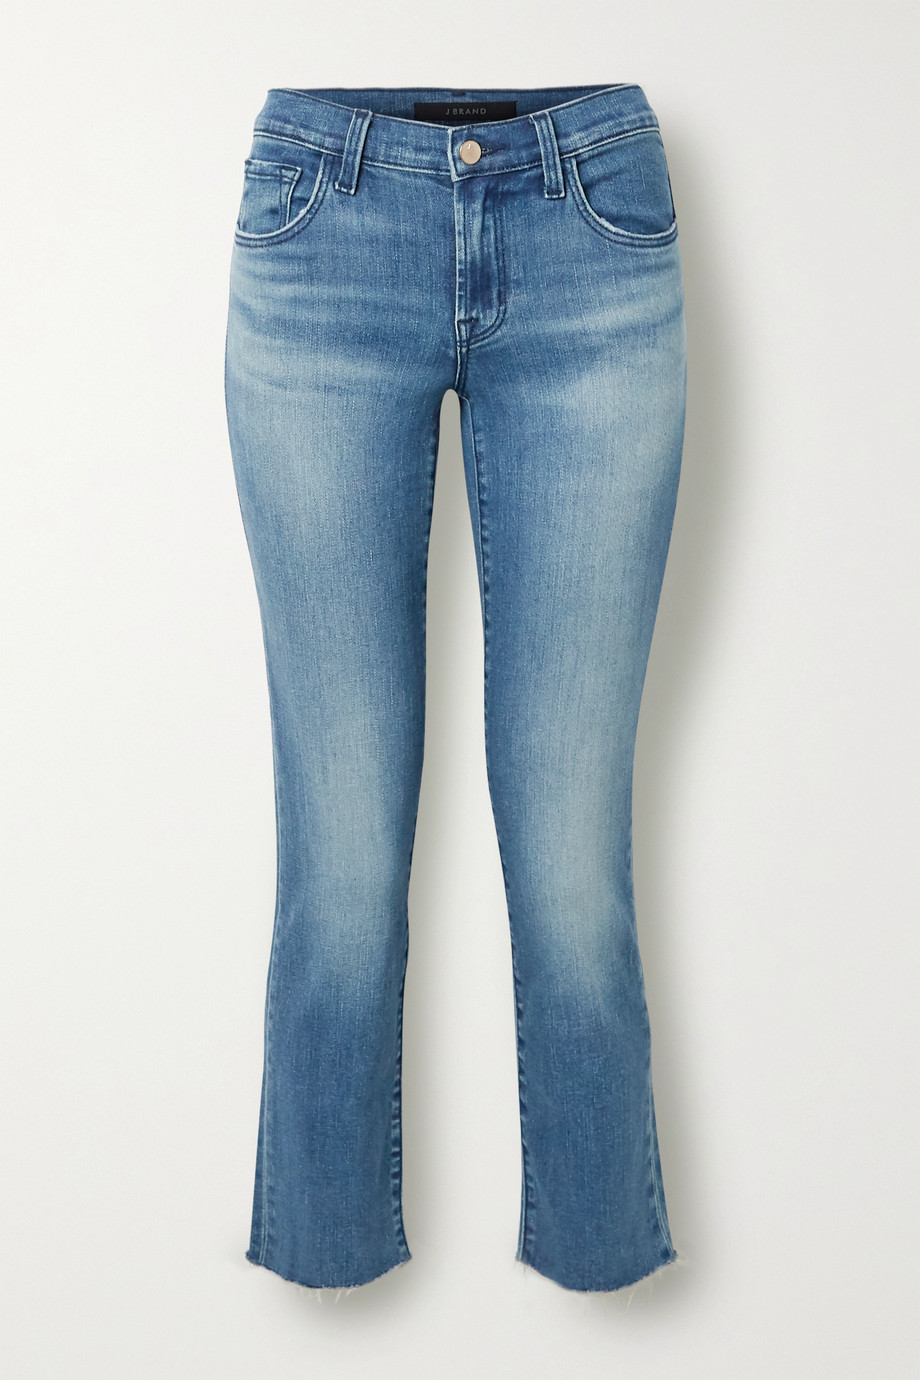 J Brand Adele cropped distressed high-rise slim-leg jeans